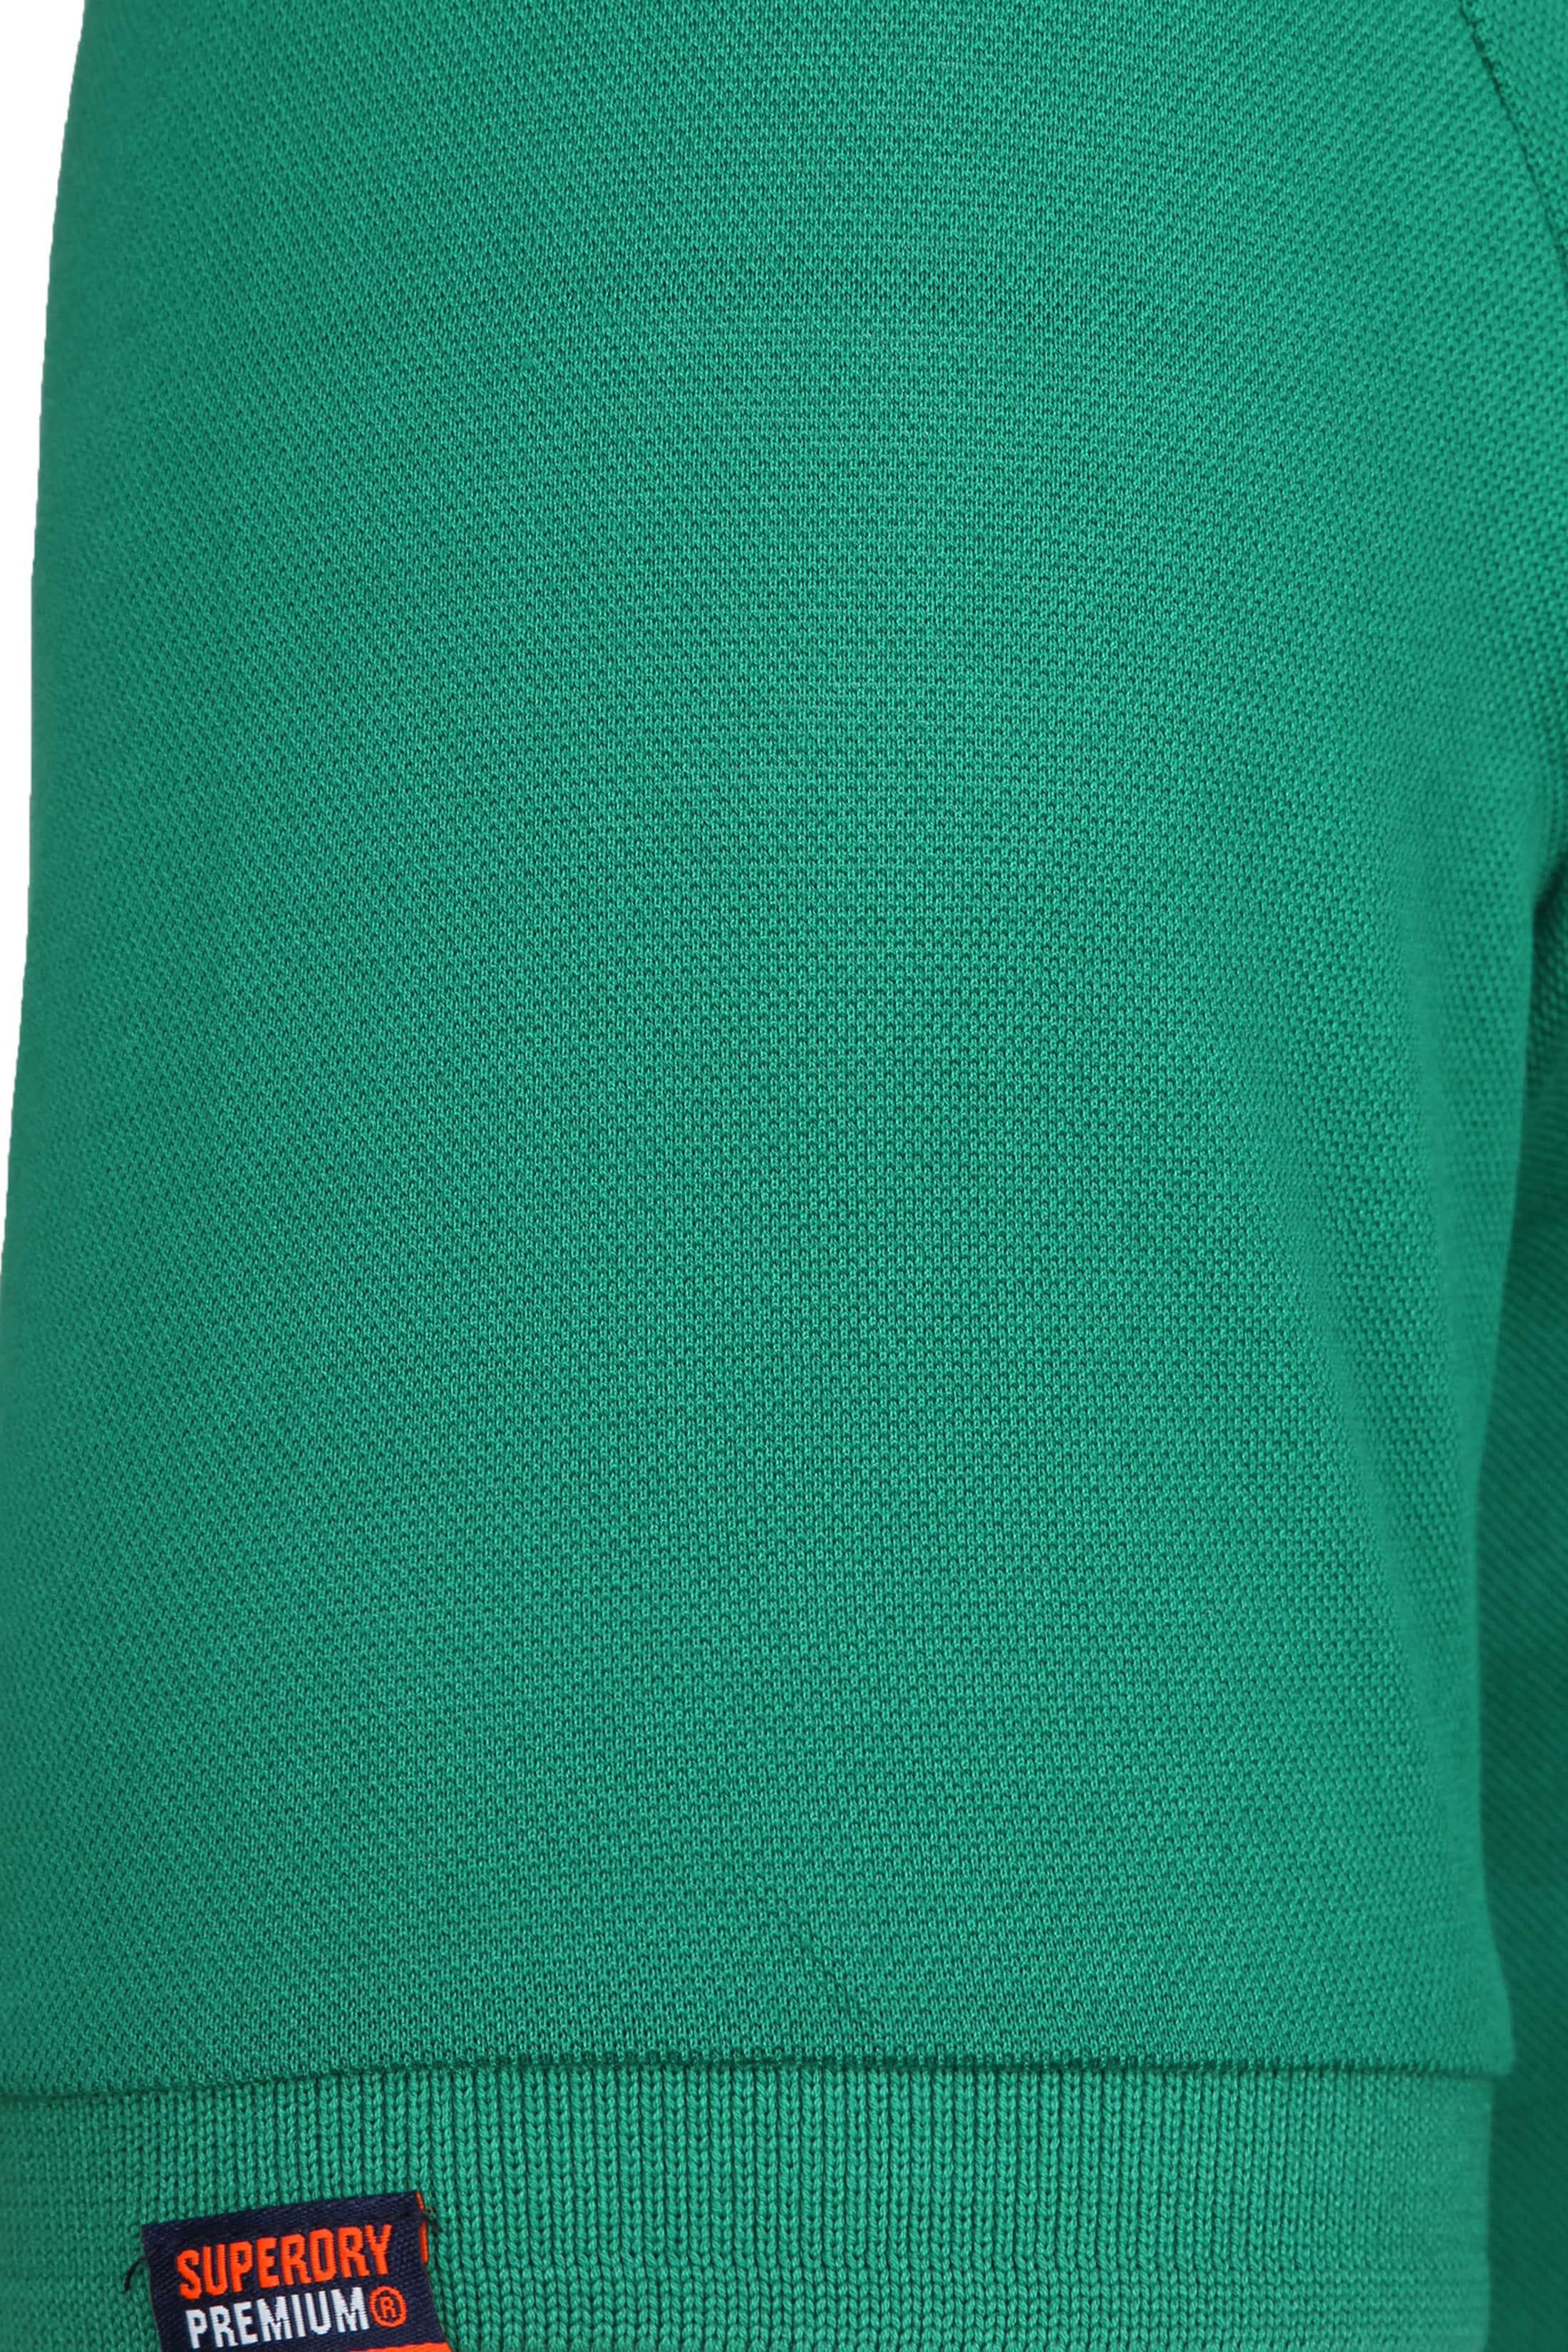 Superdry Premium Polo Green foto 3